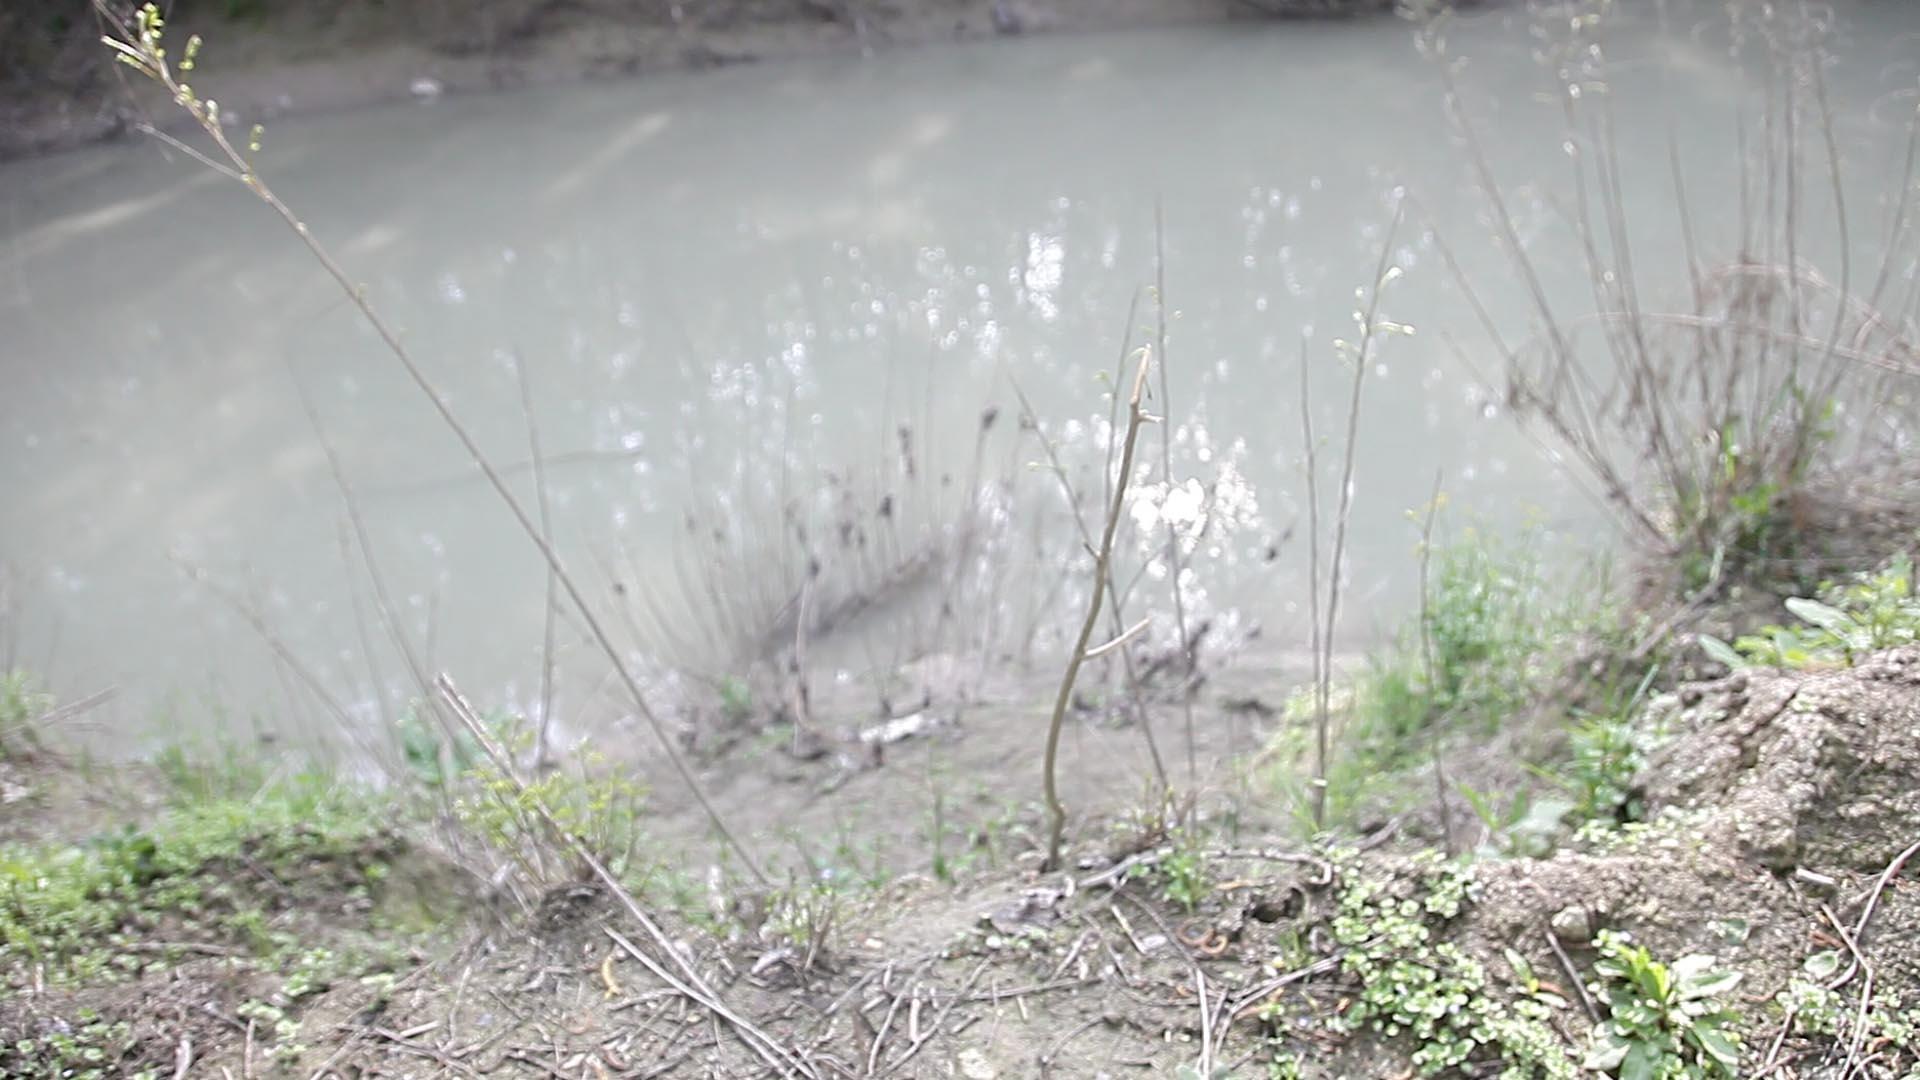 torrente Parma sfuocato.jpg